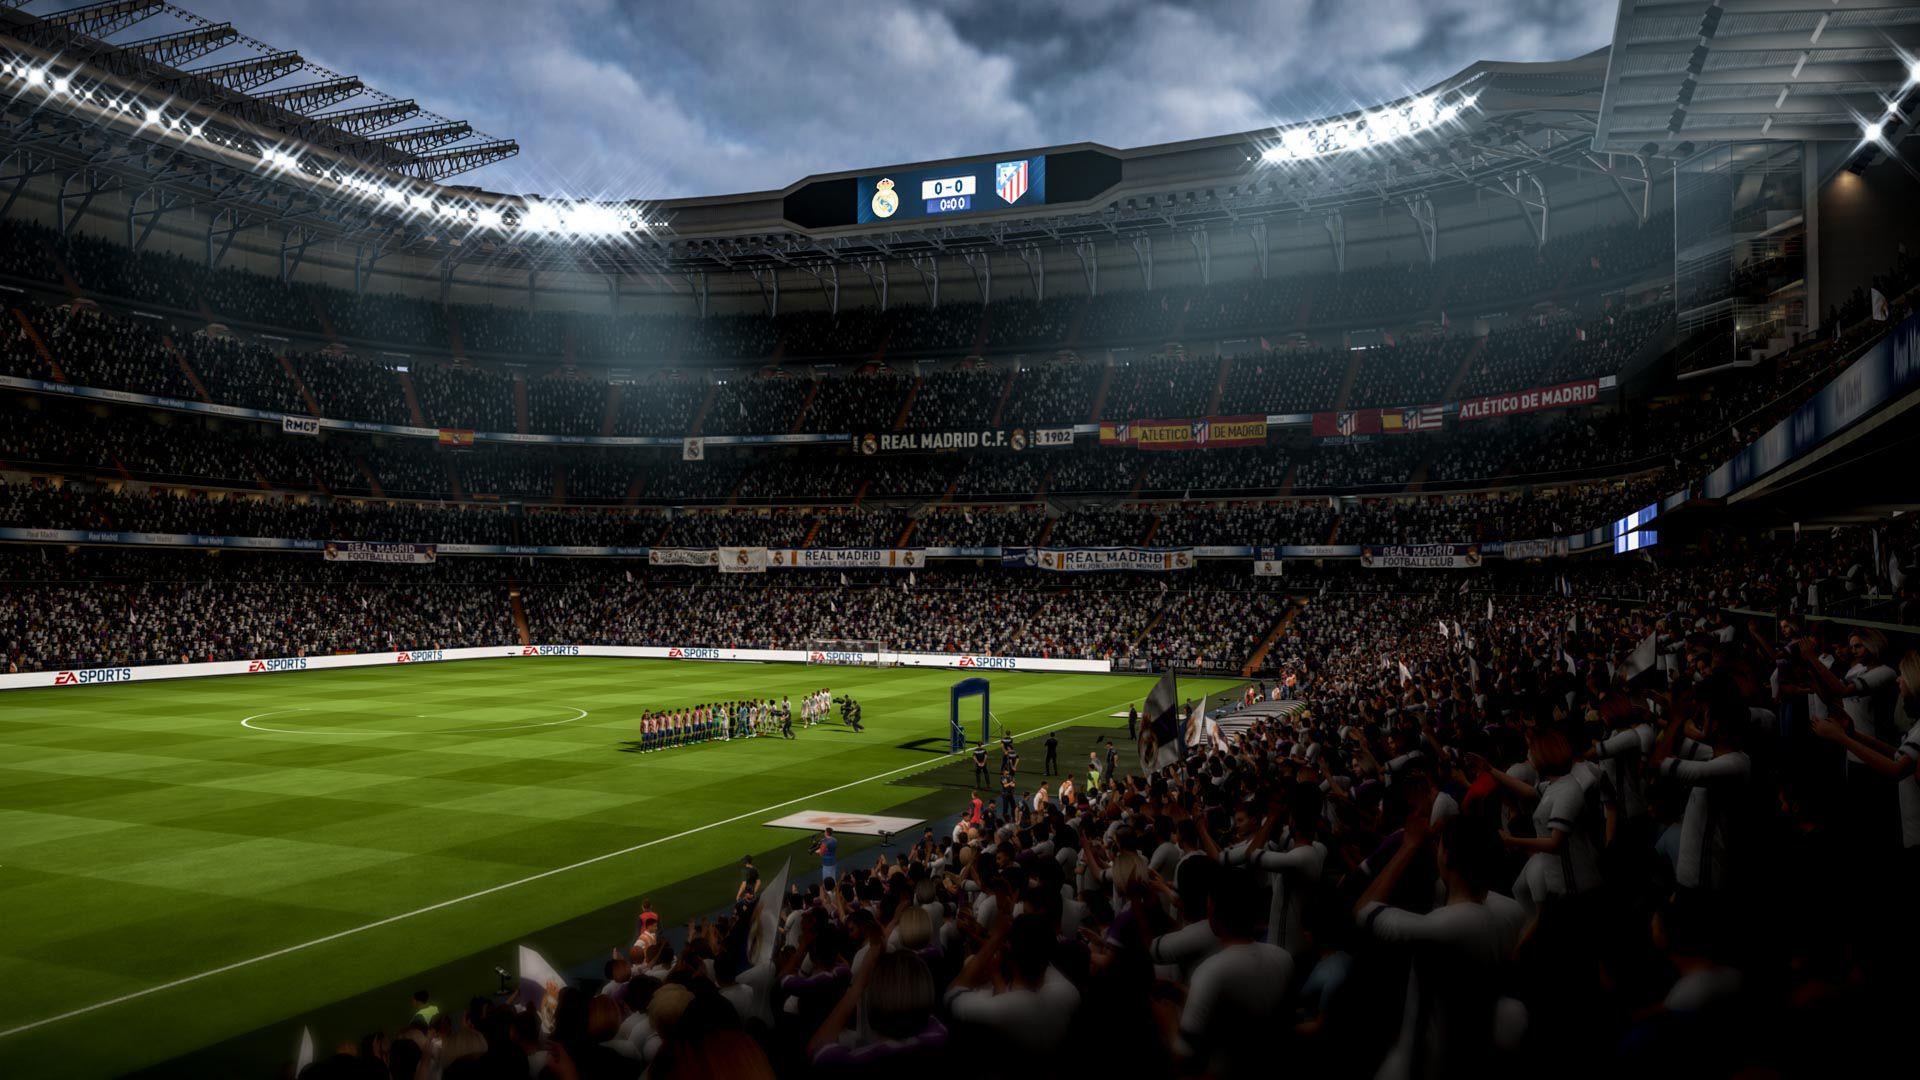 FIFA 18 Gameplay 4